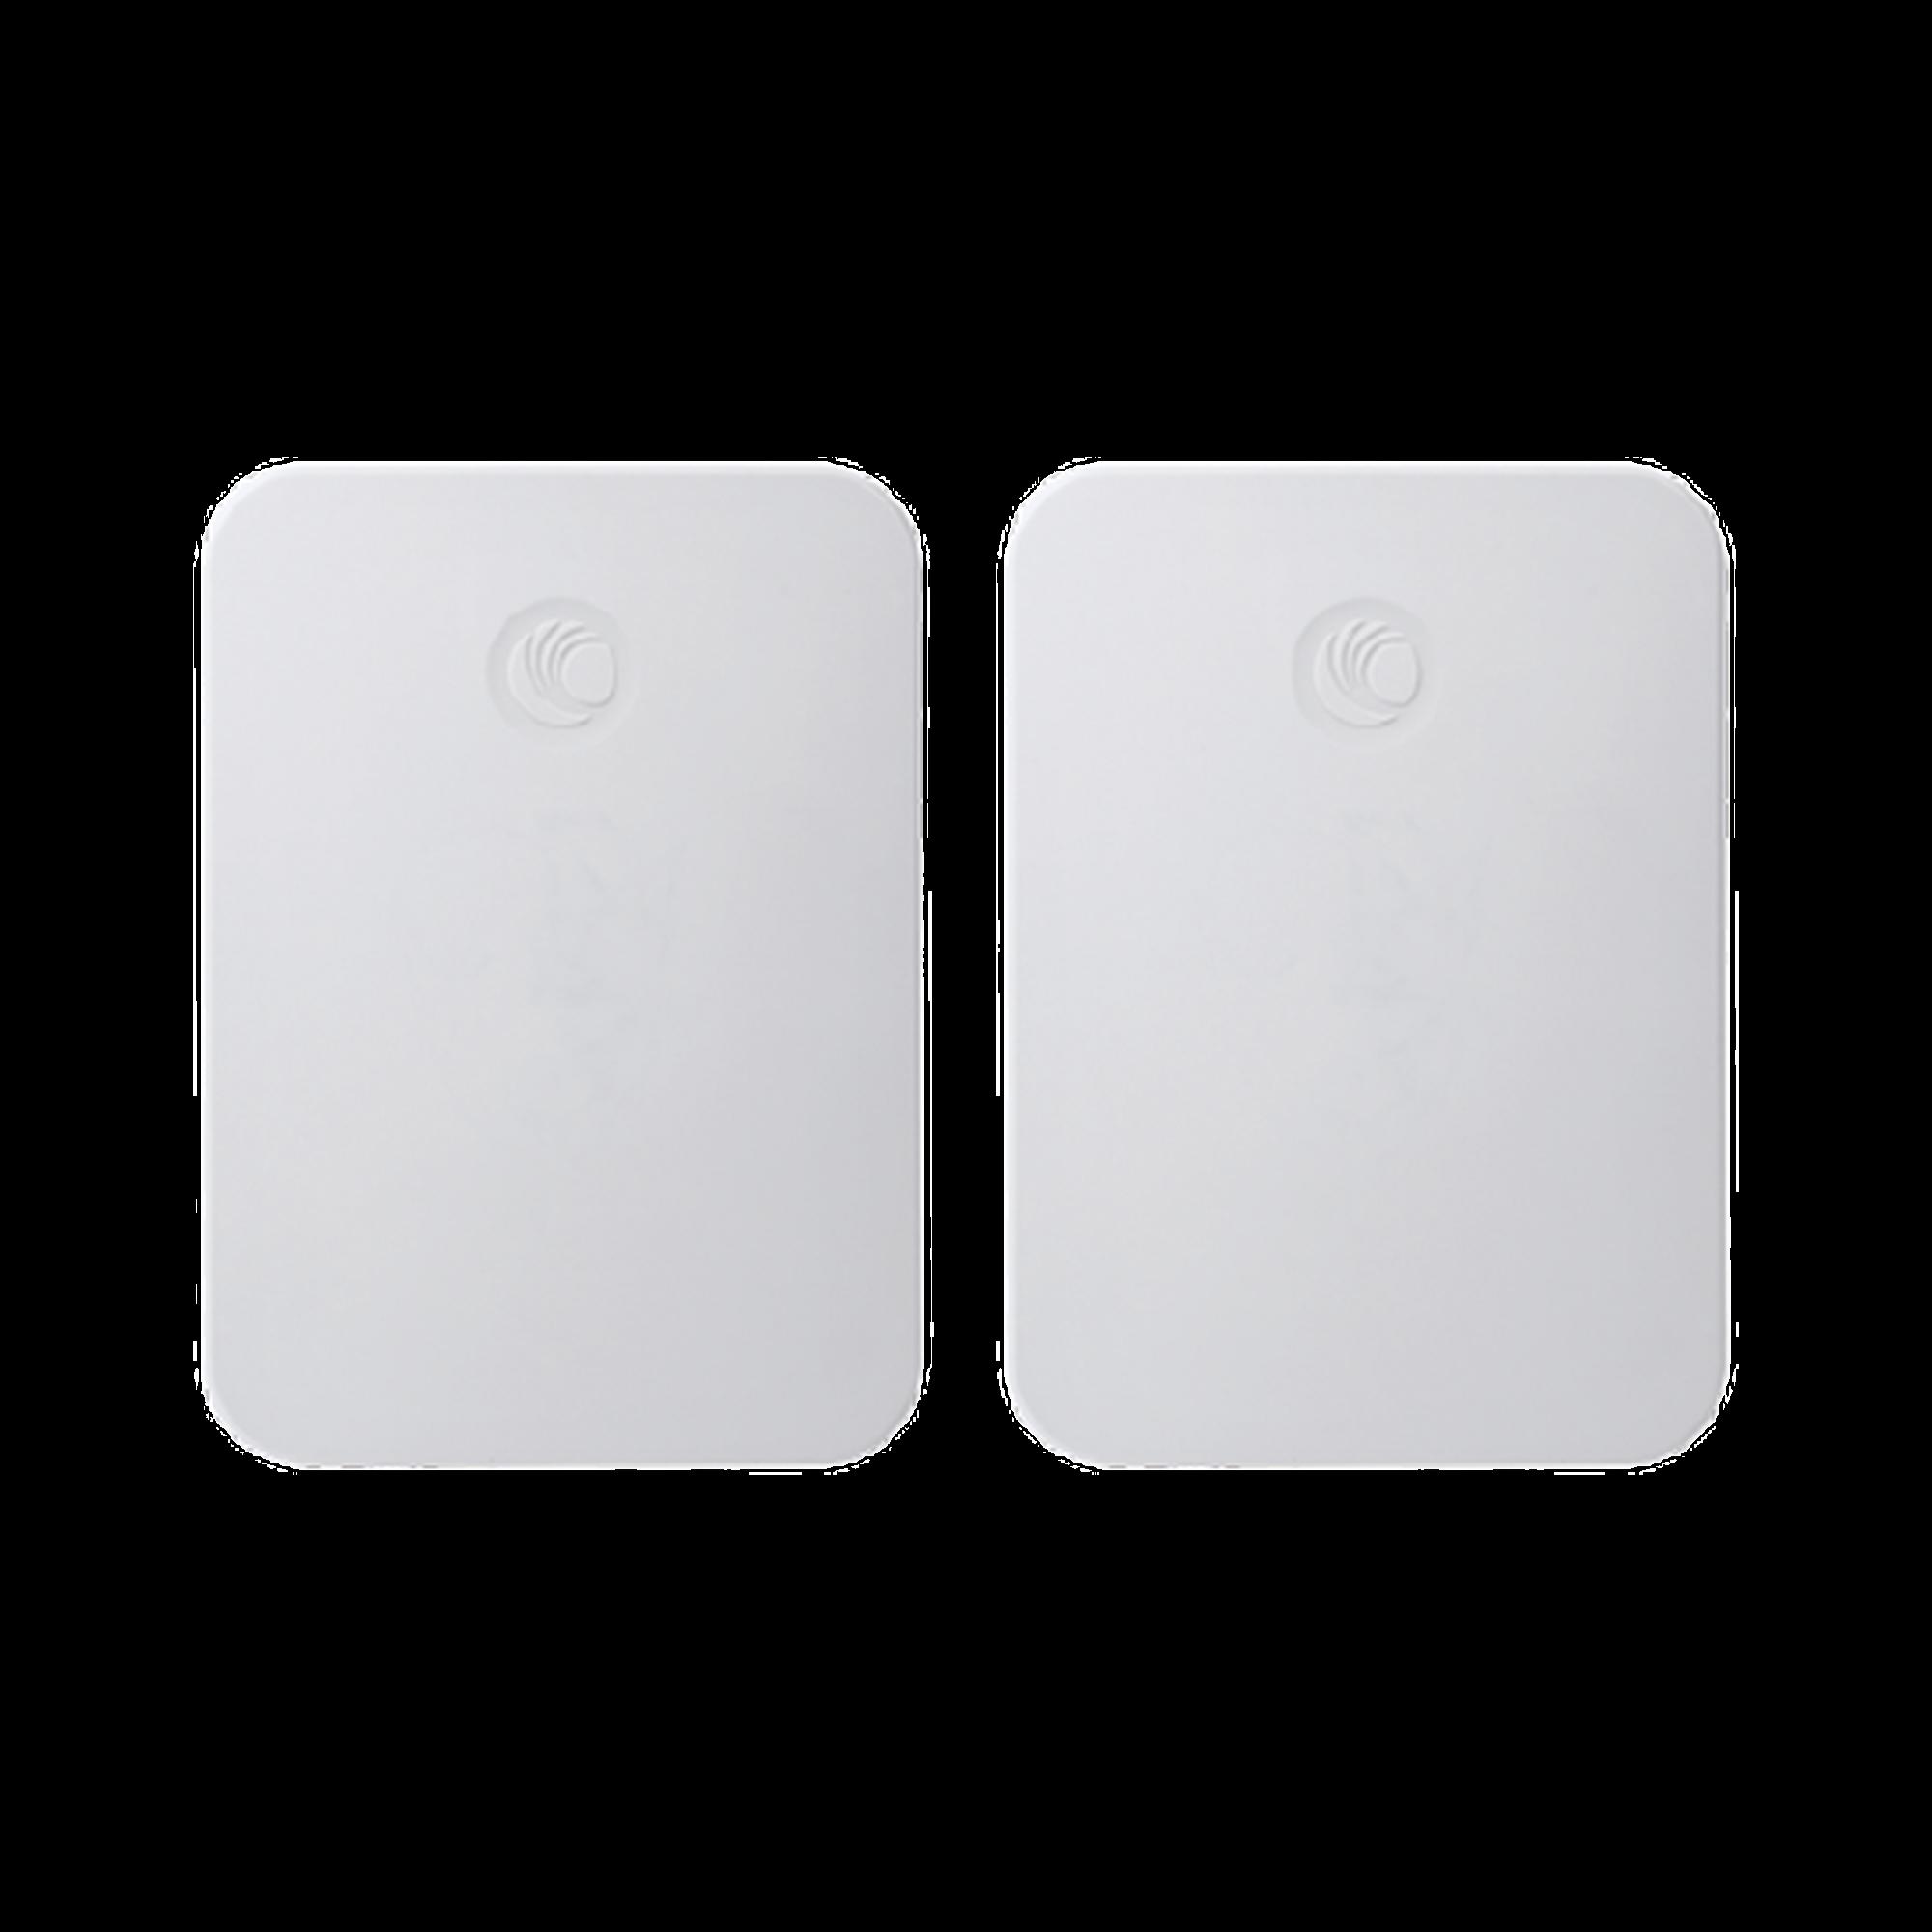 Starter Kit Wi-Fi Empresarial de 2 Access Point PLE510